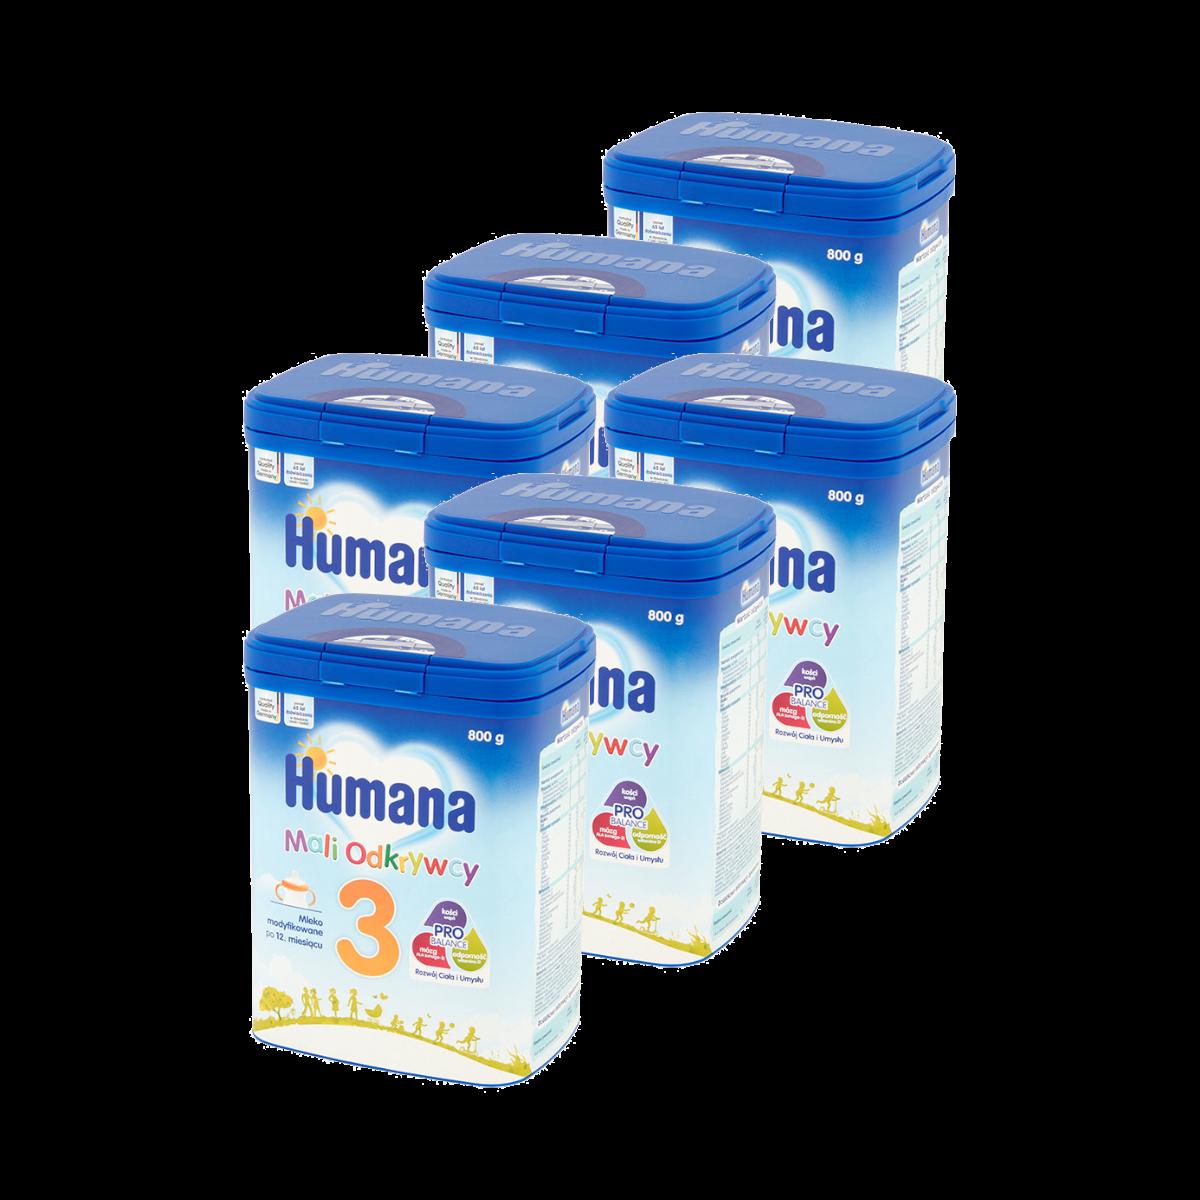 humana3_800_6pak